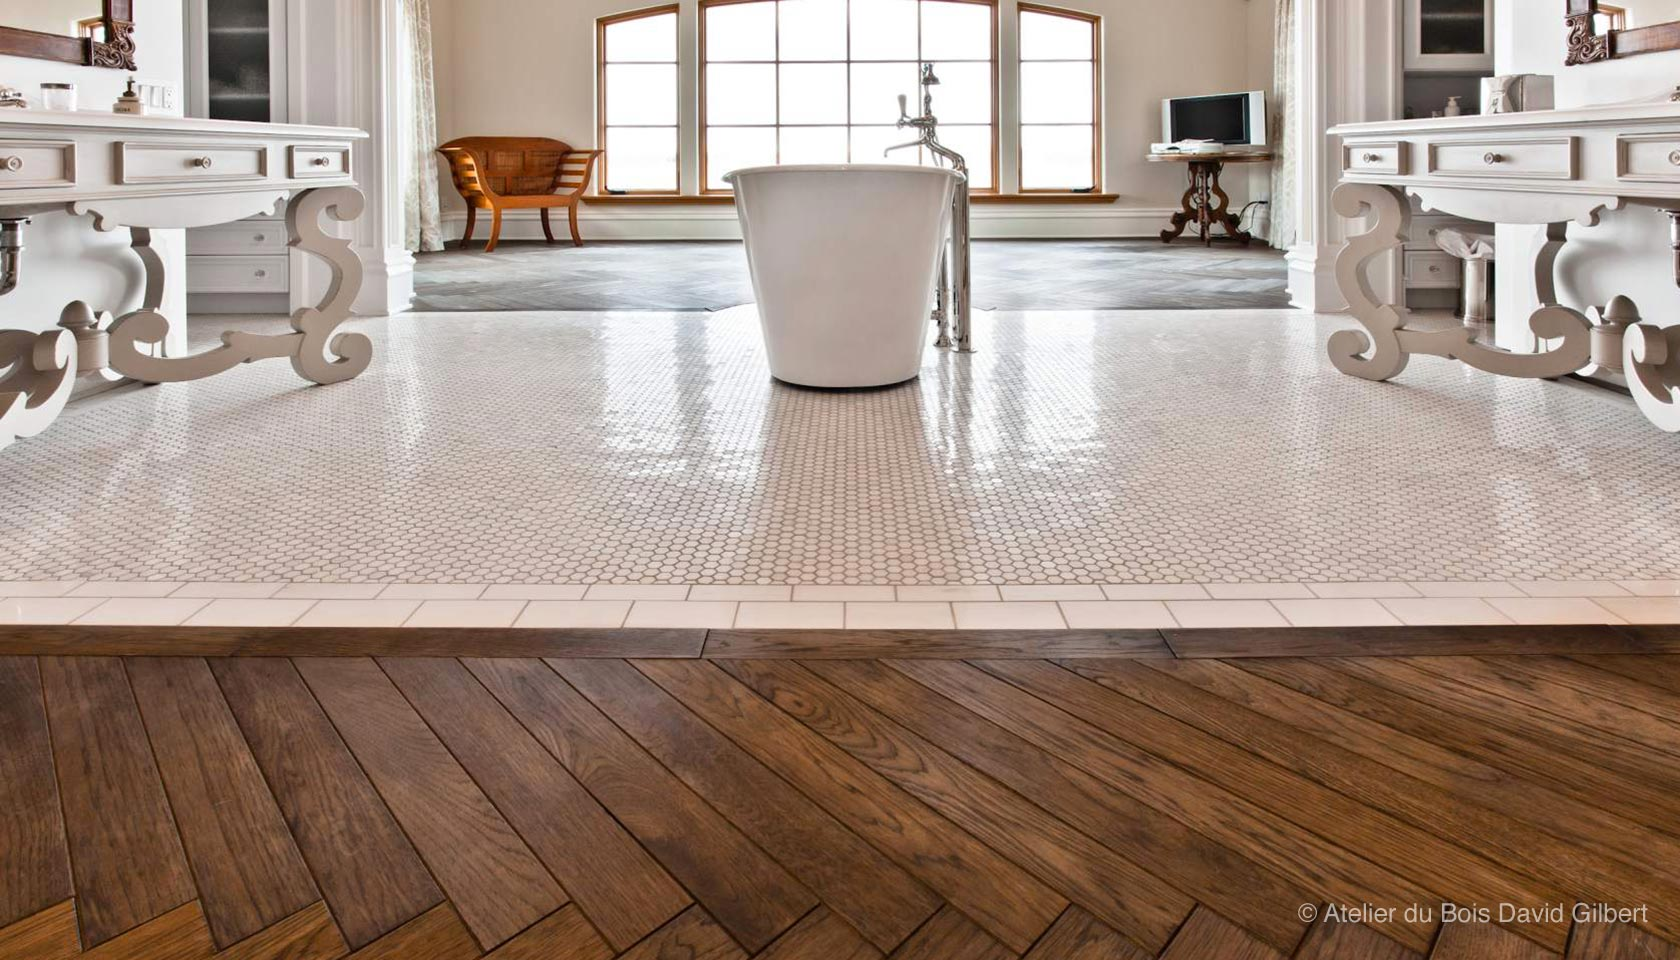 david gilbert plancher de r ing nierie sur mesure. Black Bedroom Furniture Sets. Home Design Ideas